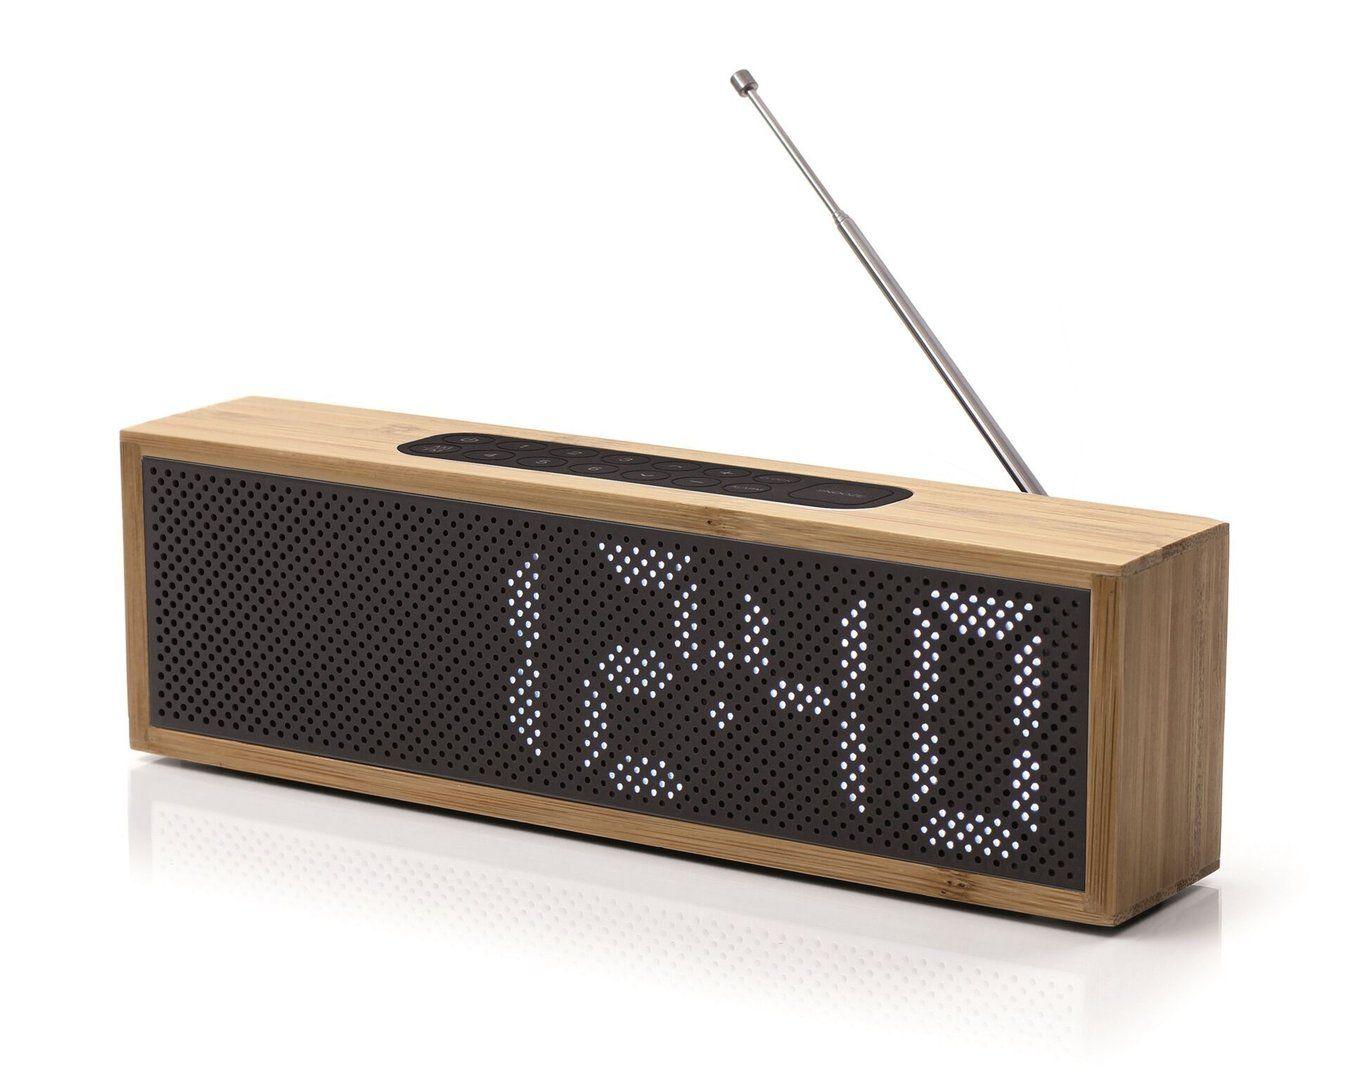 Lexon Radio Wecker Titanium Wecker Radiowecker Radios